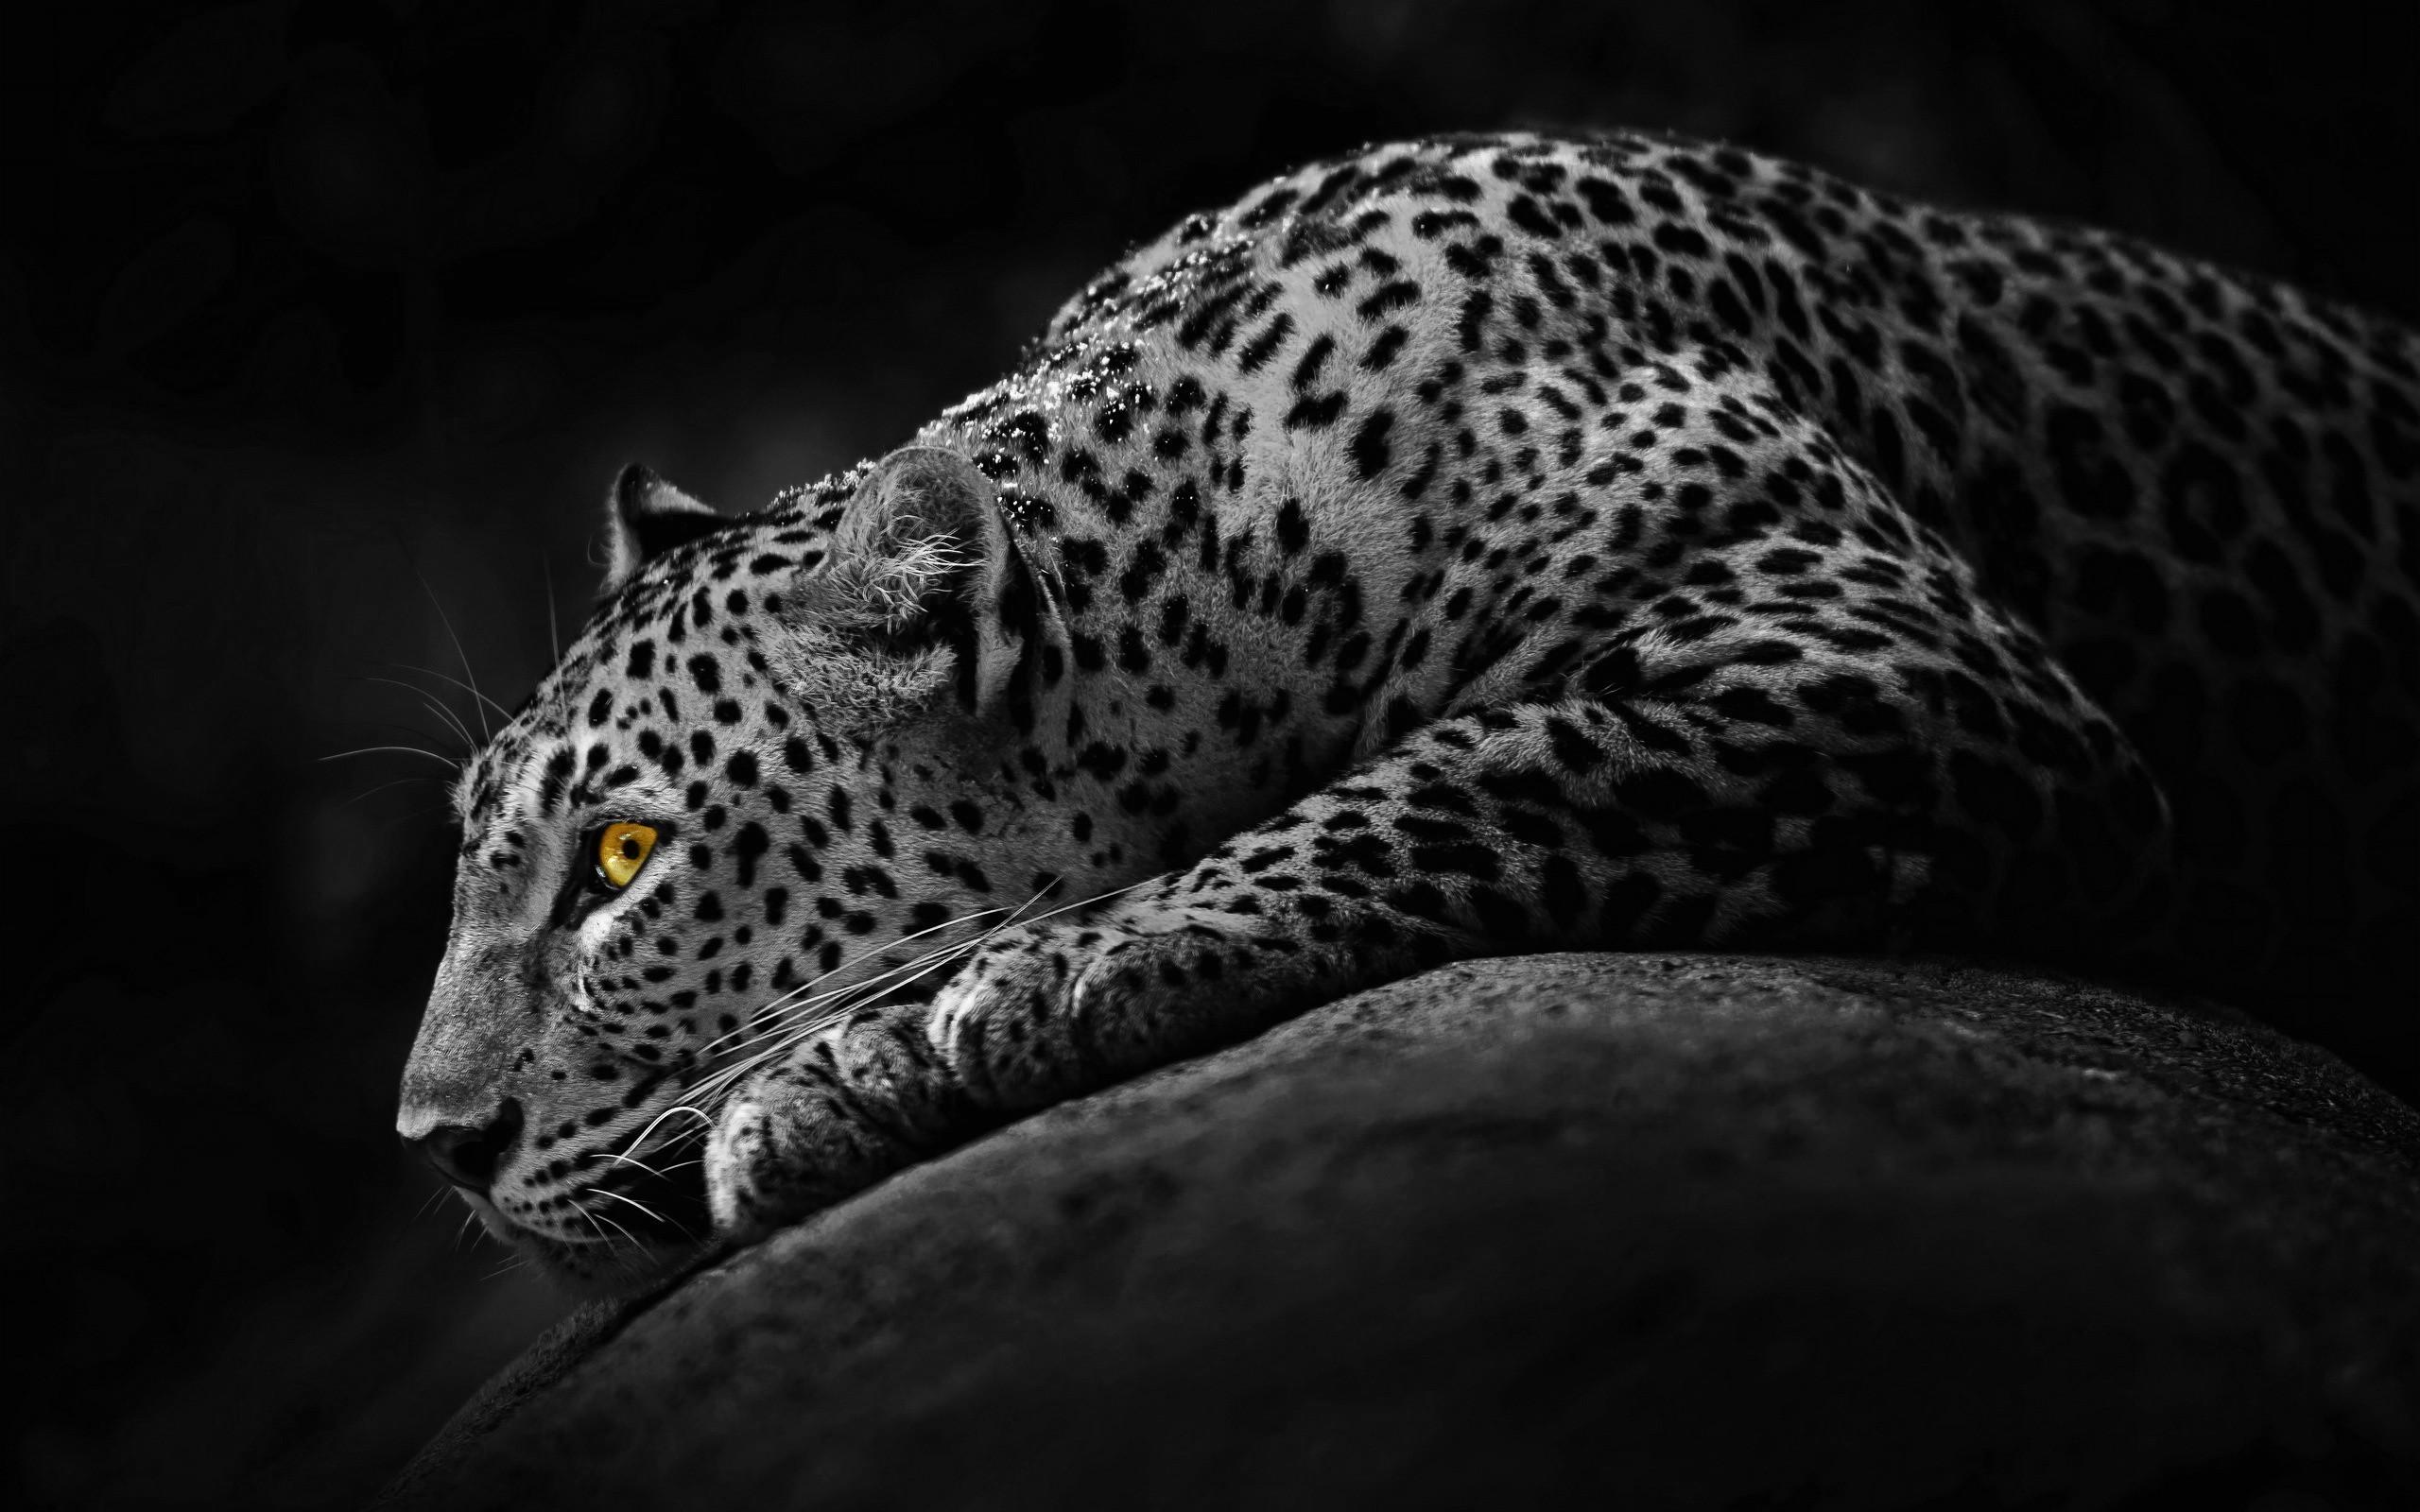 Free Download Black Jaguar Animal Wallpaper 2560x1600 For Your Desktop Mobile Tablet Explore 44 Jaguar Wallpapers Hd Black Jaguar Wallpaper Jacksonville Jaguars Hd Wallpaper Jaguar Xf Wallpaper Hd